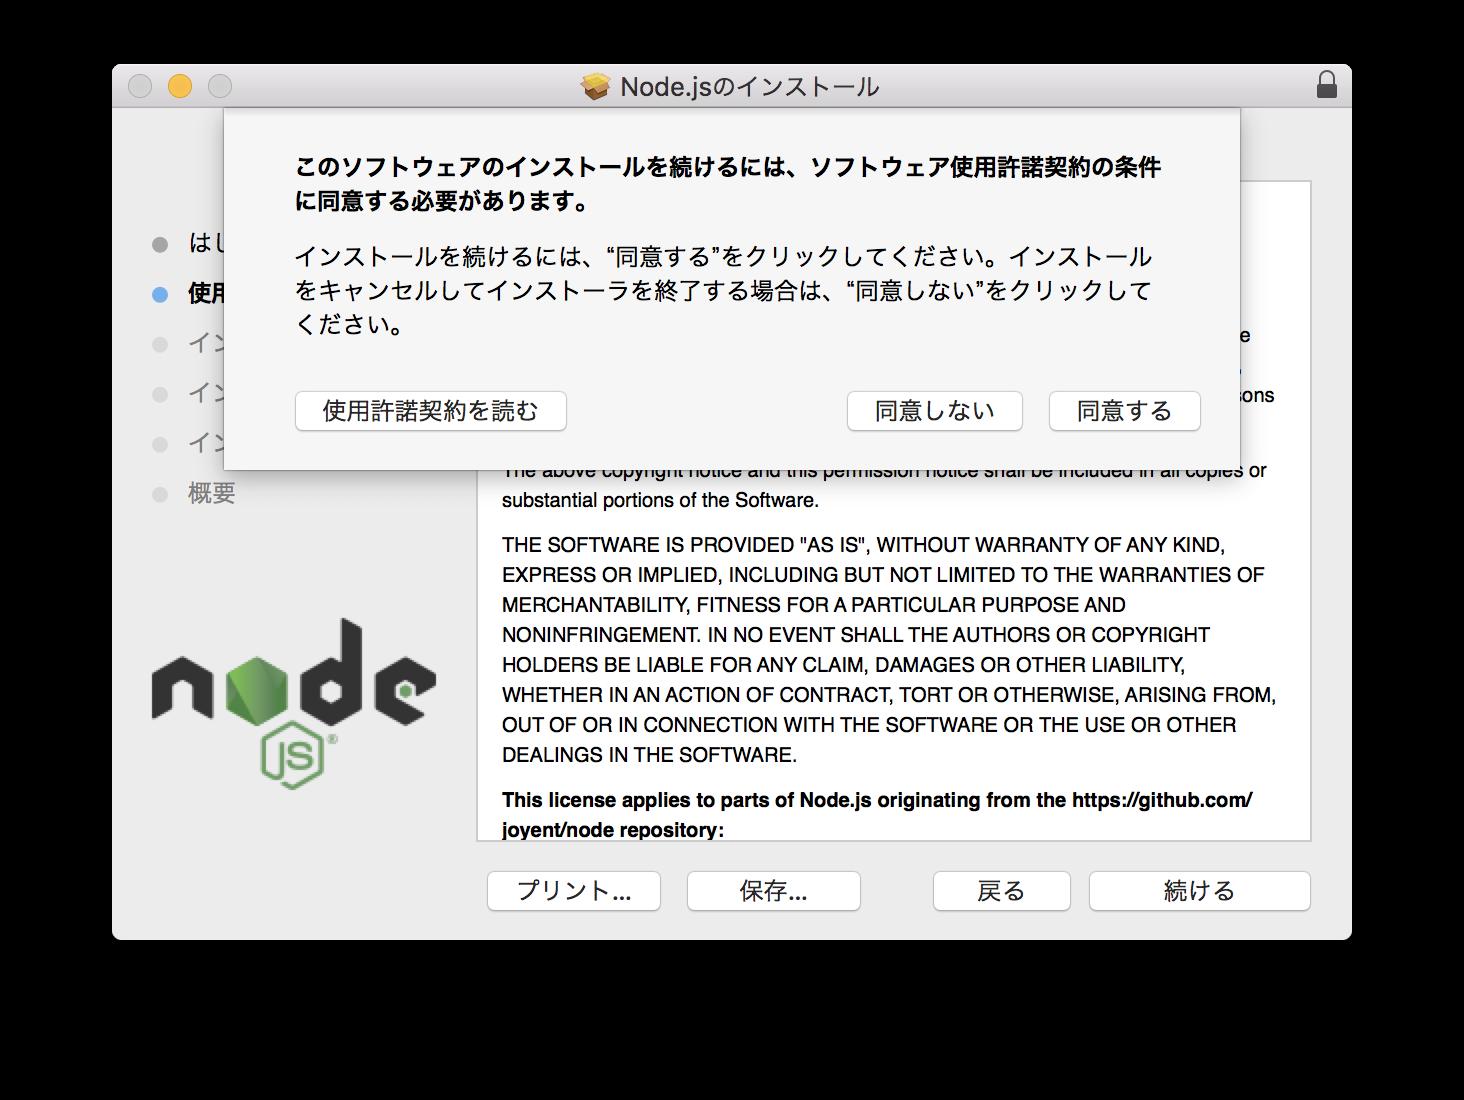 tutorial 3 5 - Node.js - ダウンロードとインストール手順